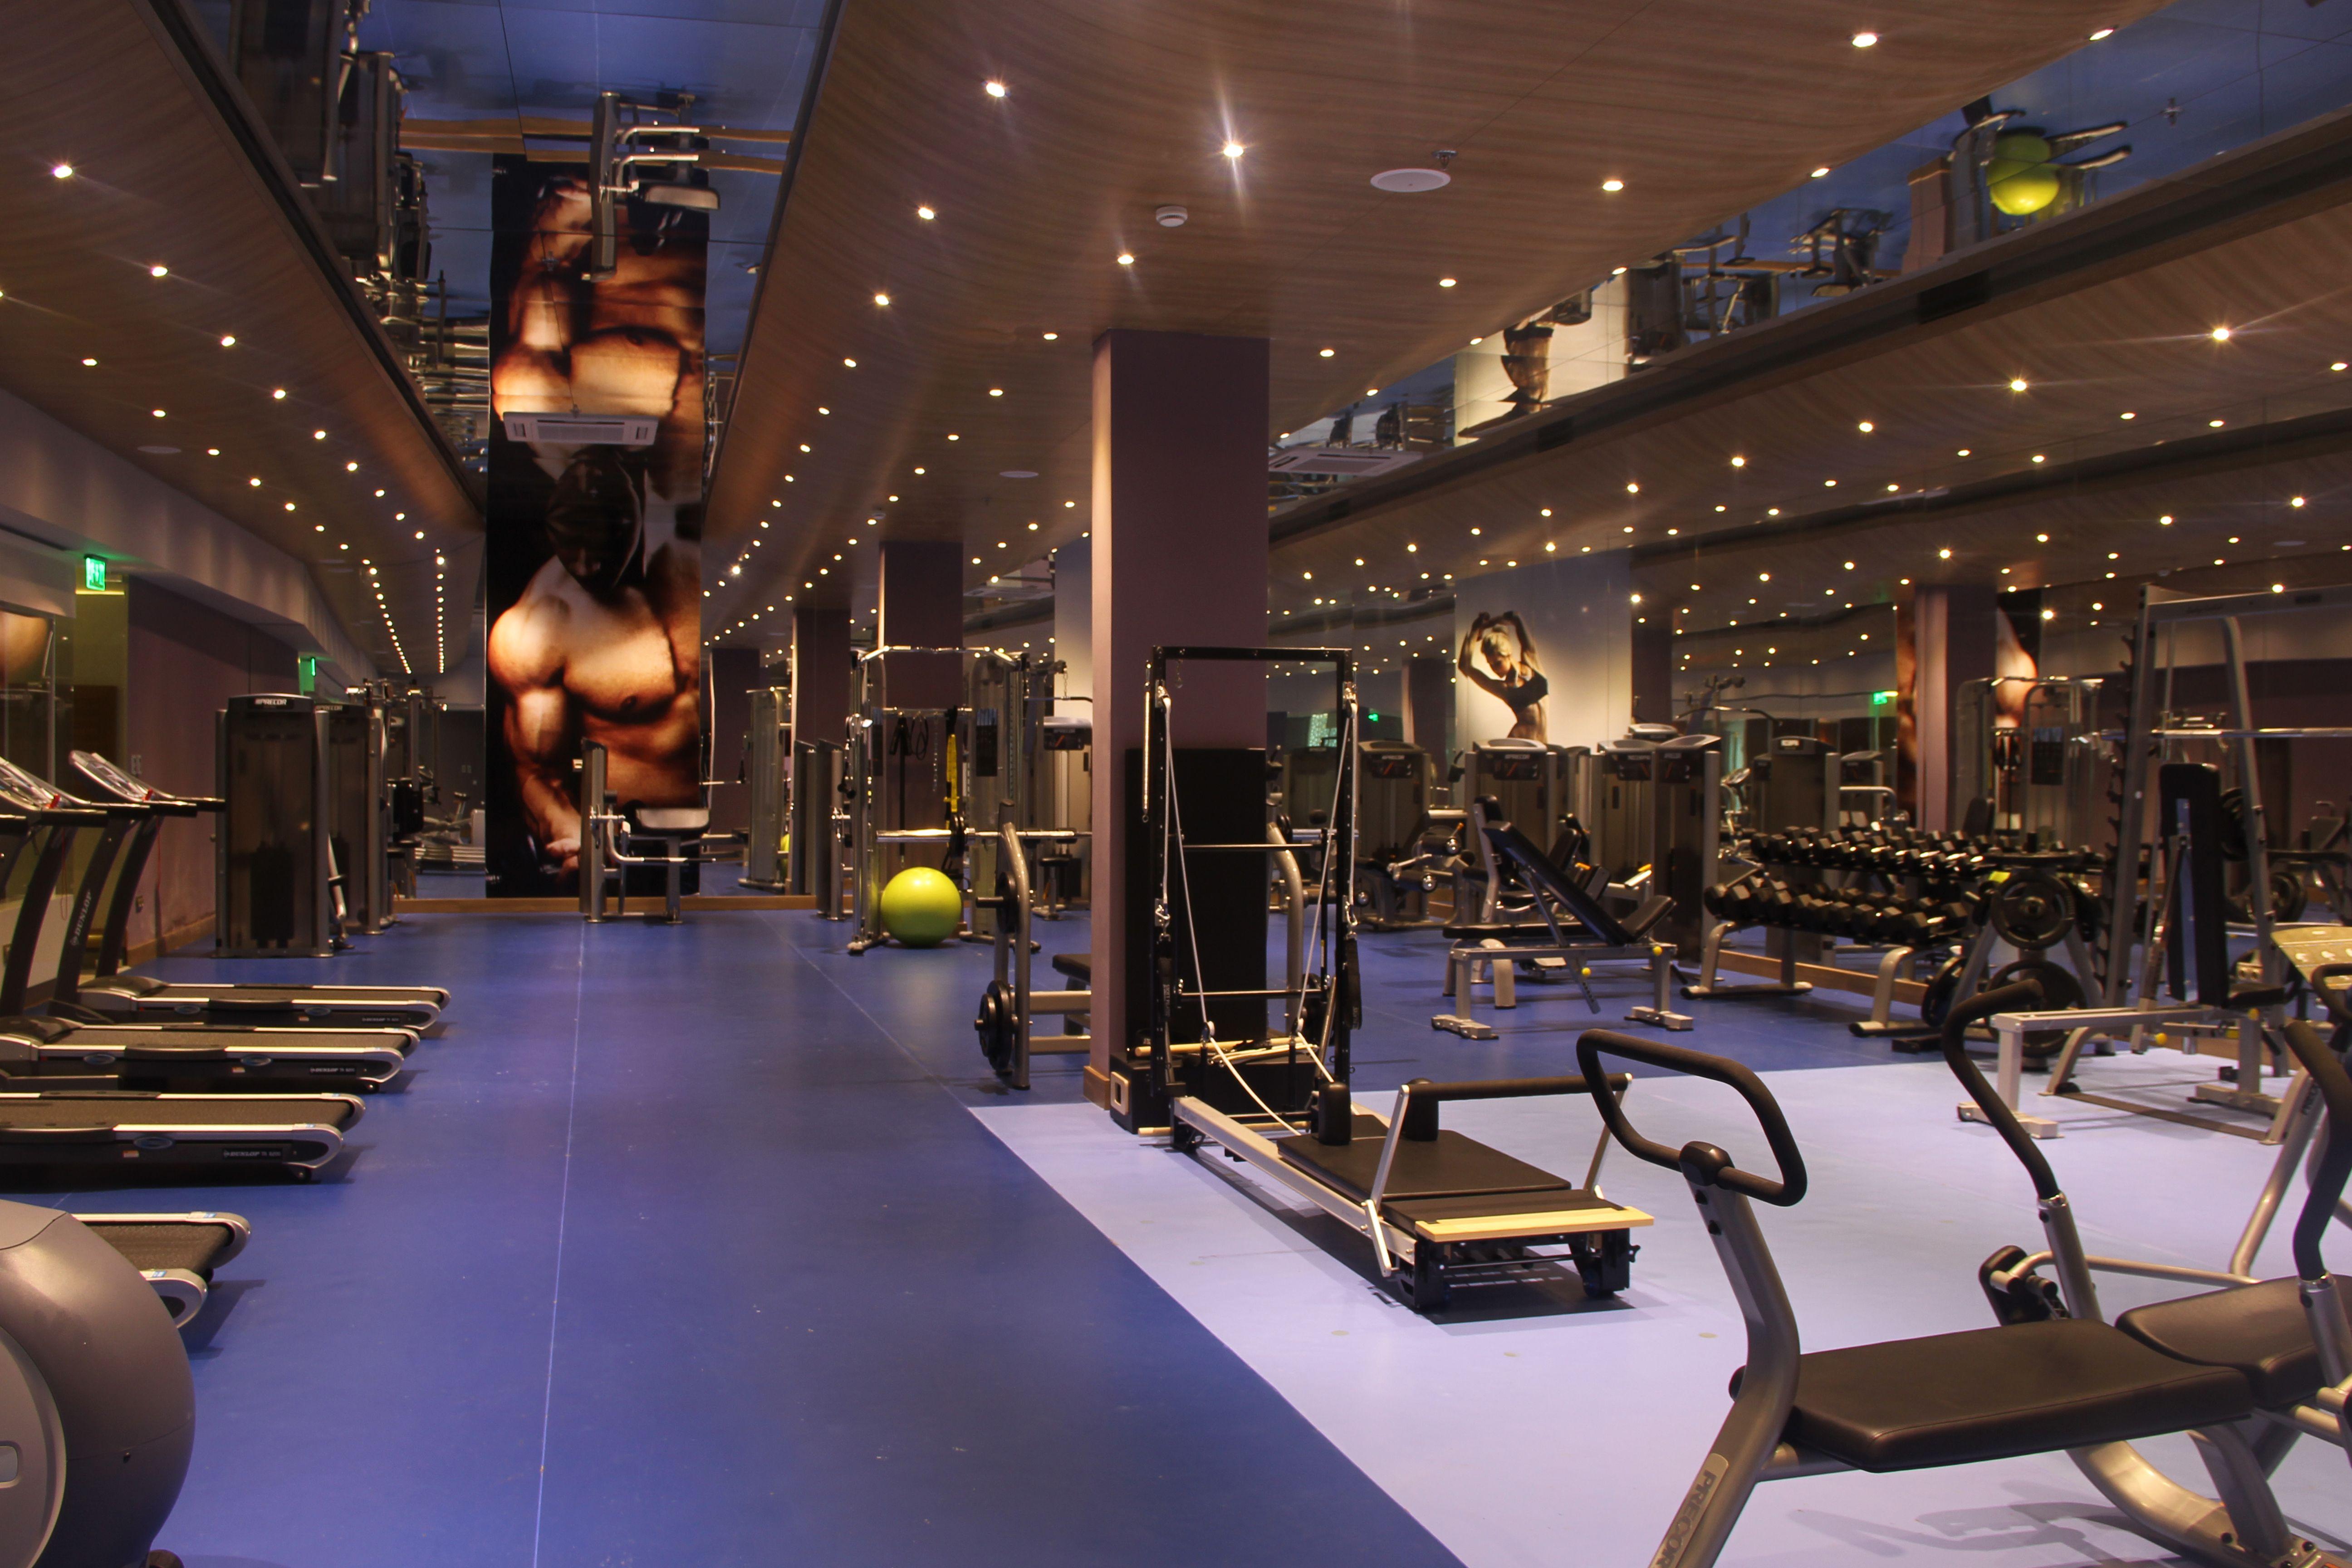 Sentido Golden Bay Hotel  Fitness Center